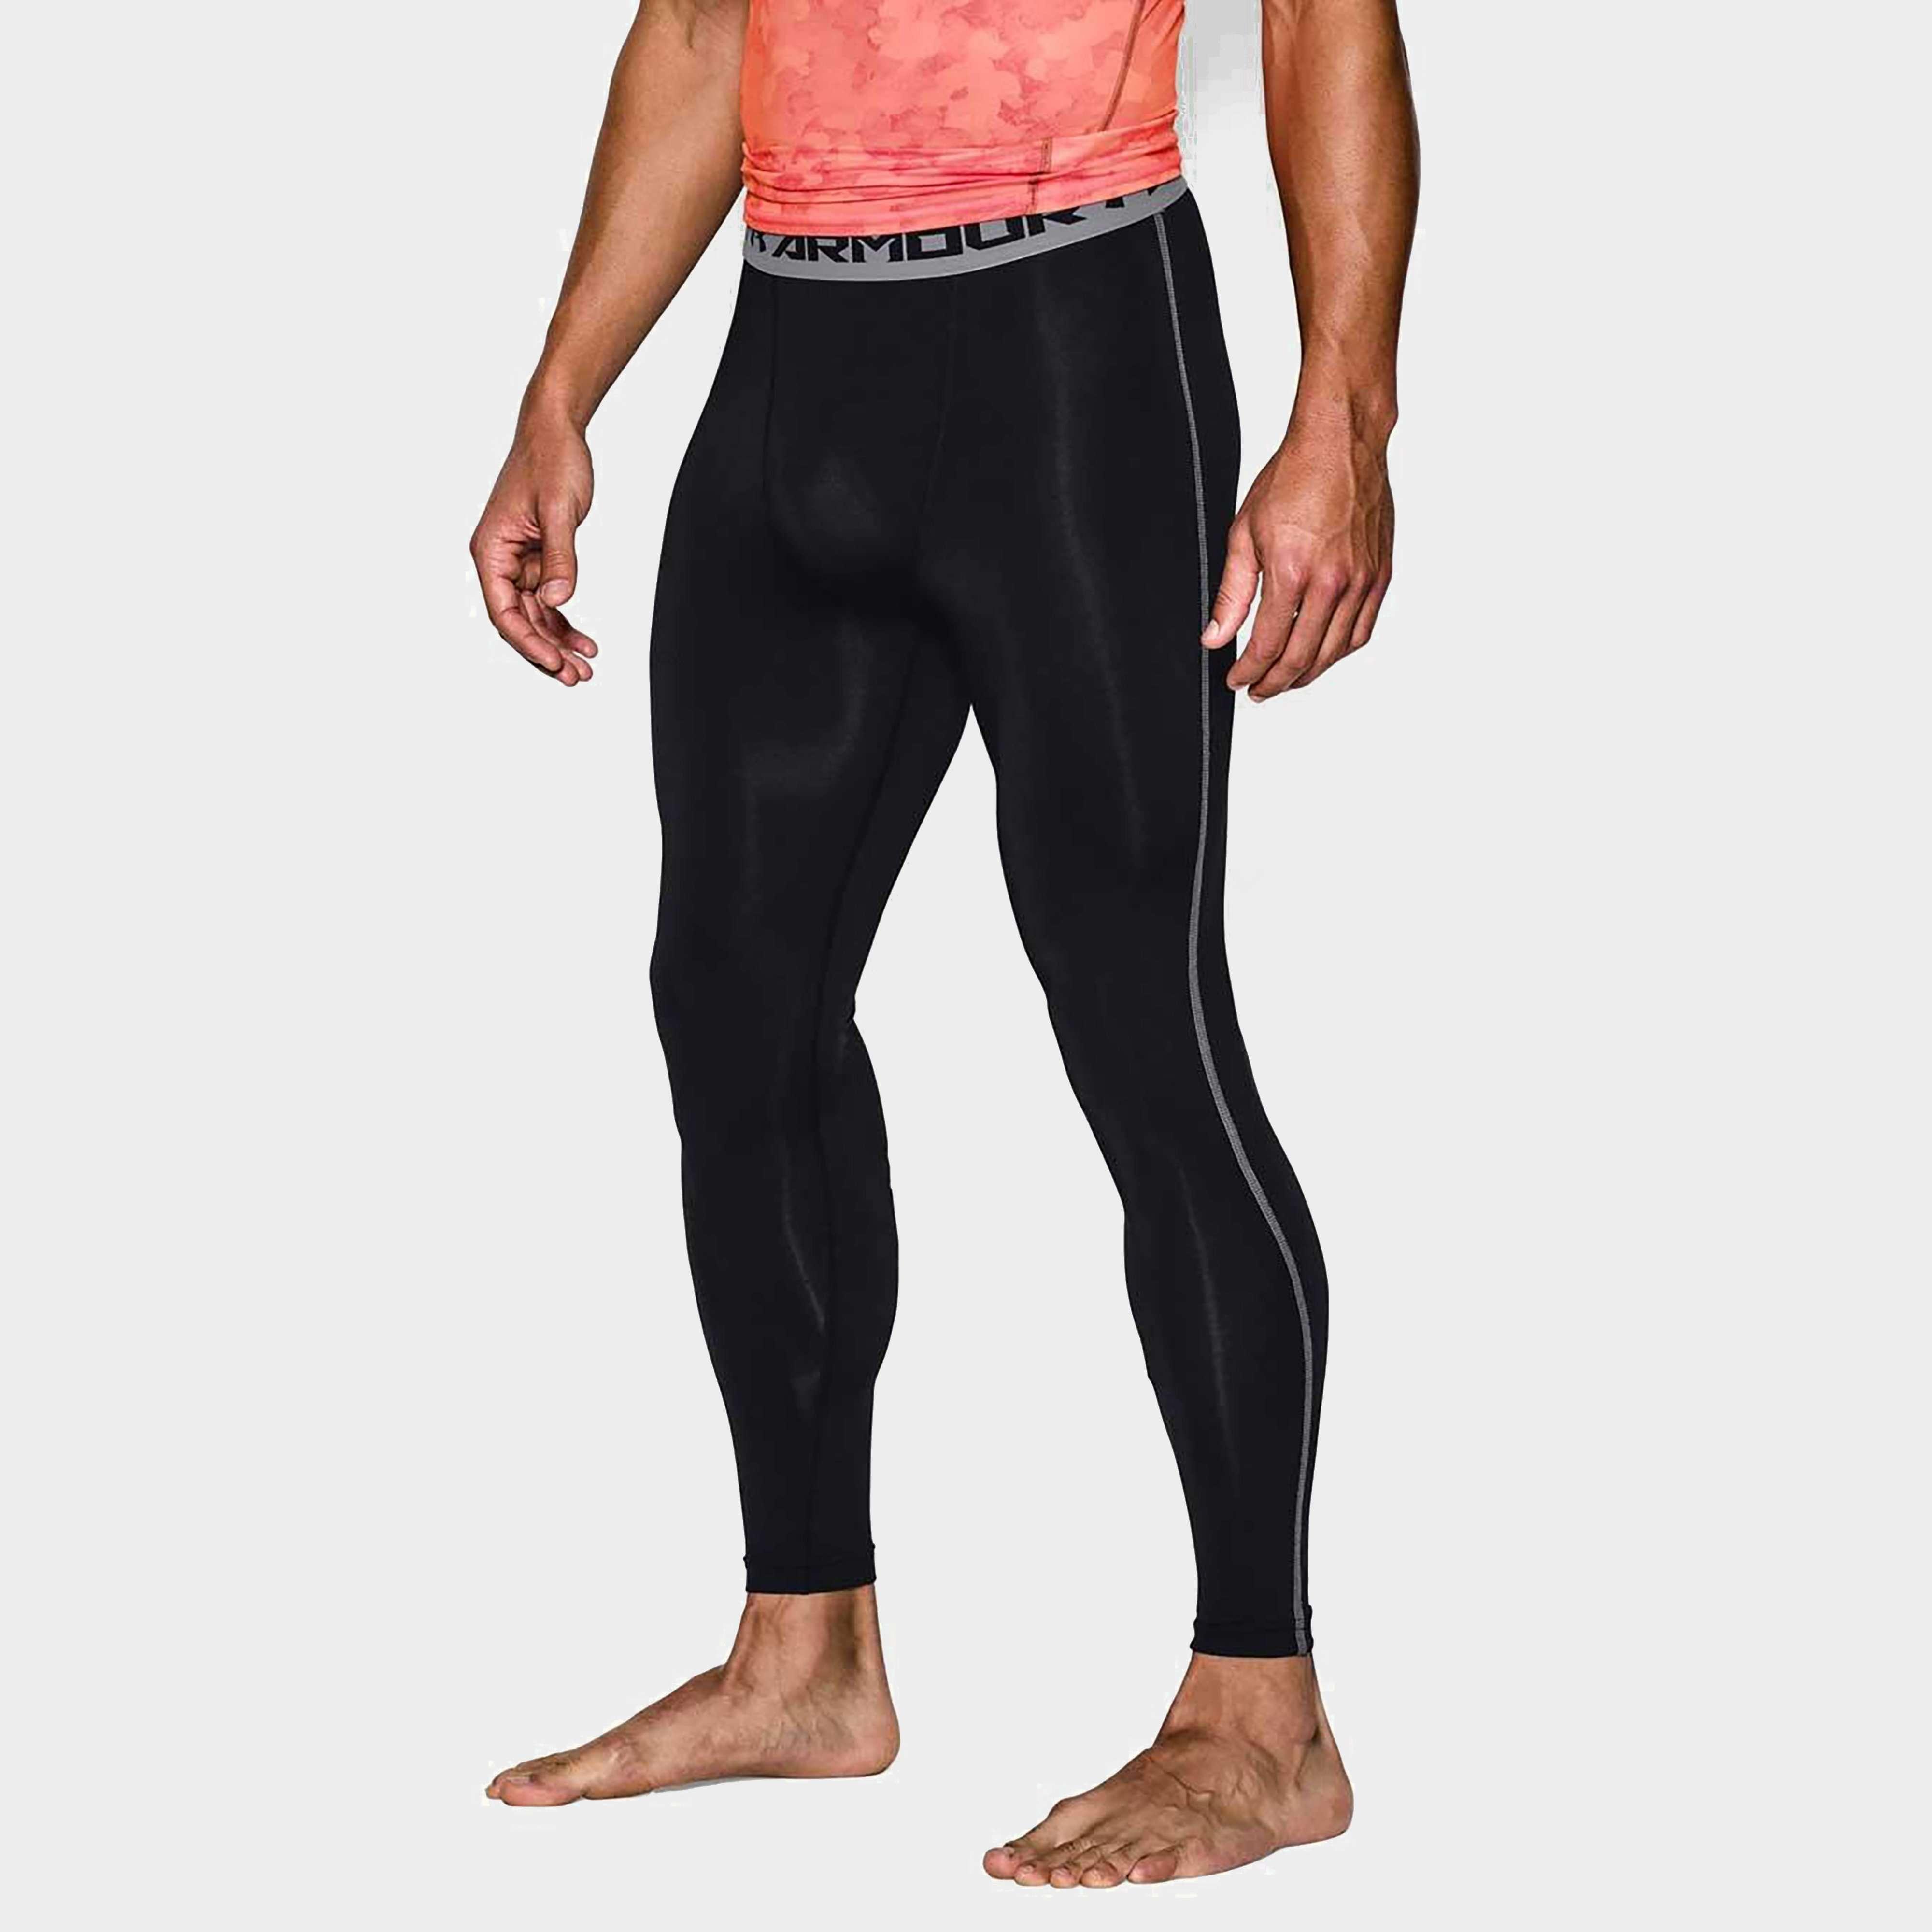 UNDER ARMOUR Men's HeatGear® Armour Compression Leggings